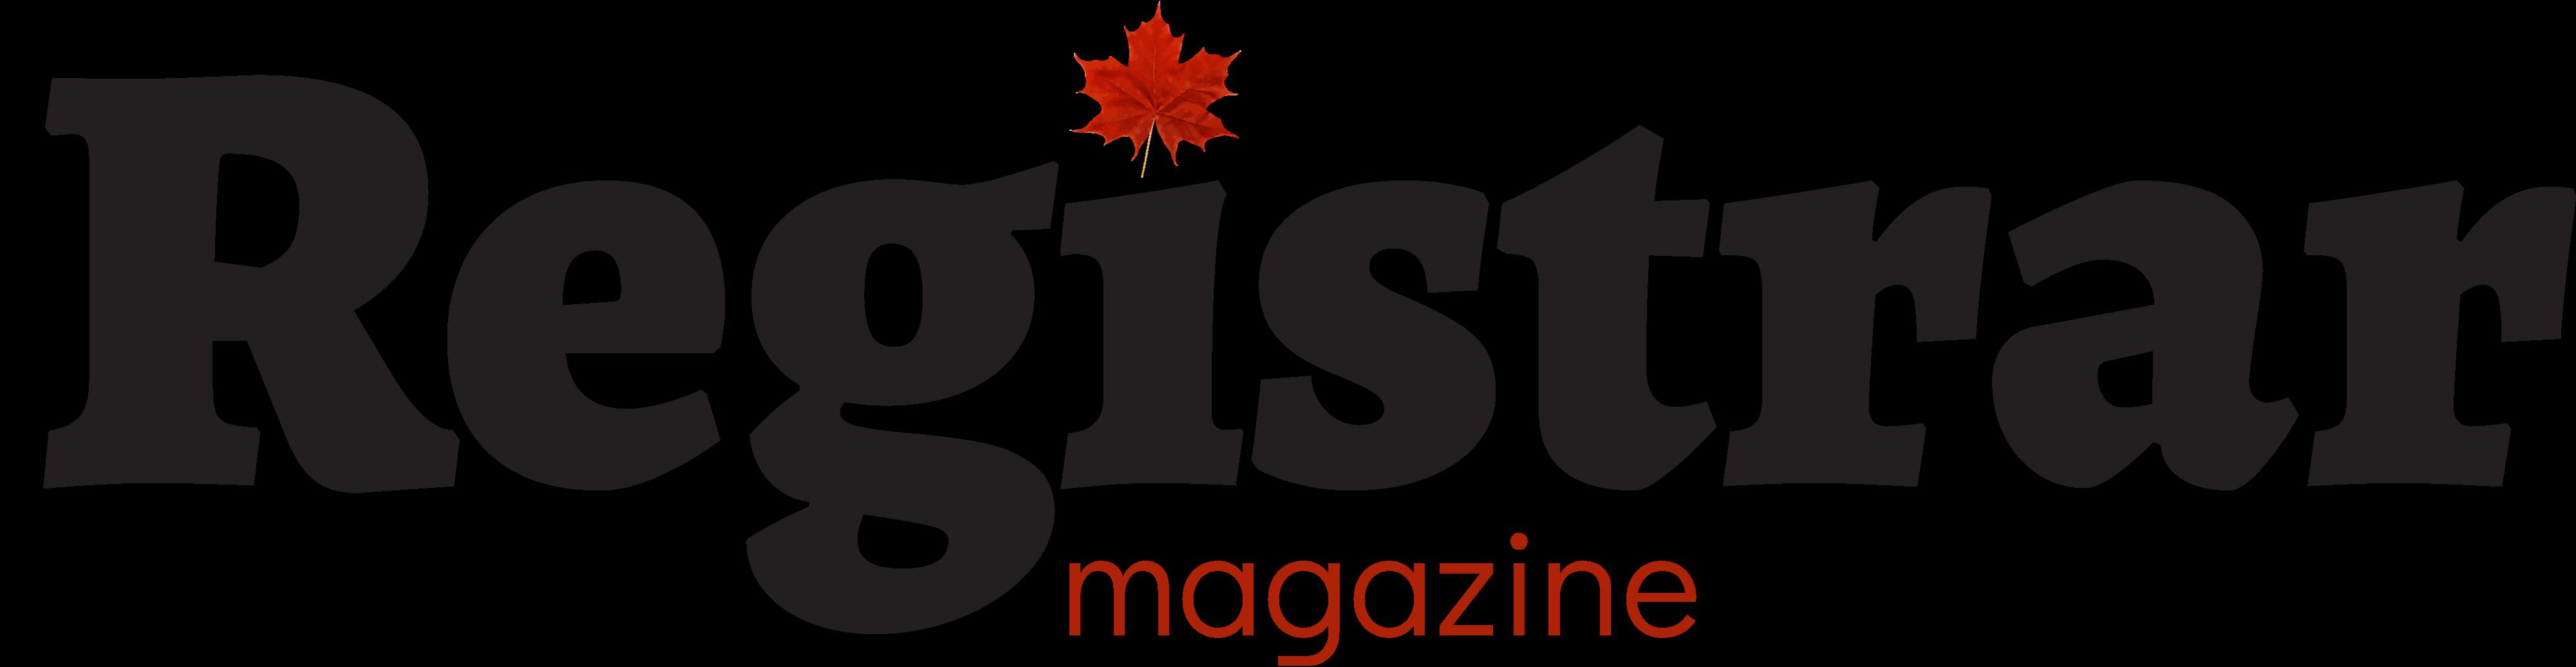 The Registrar magazine